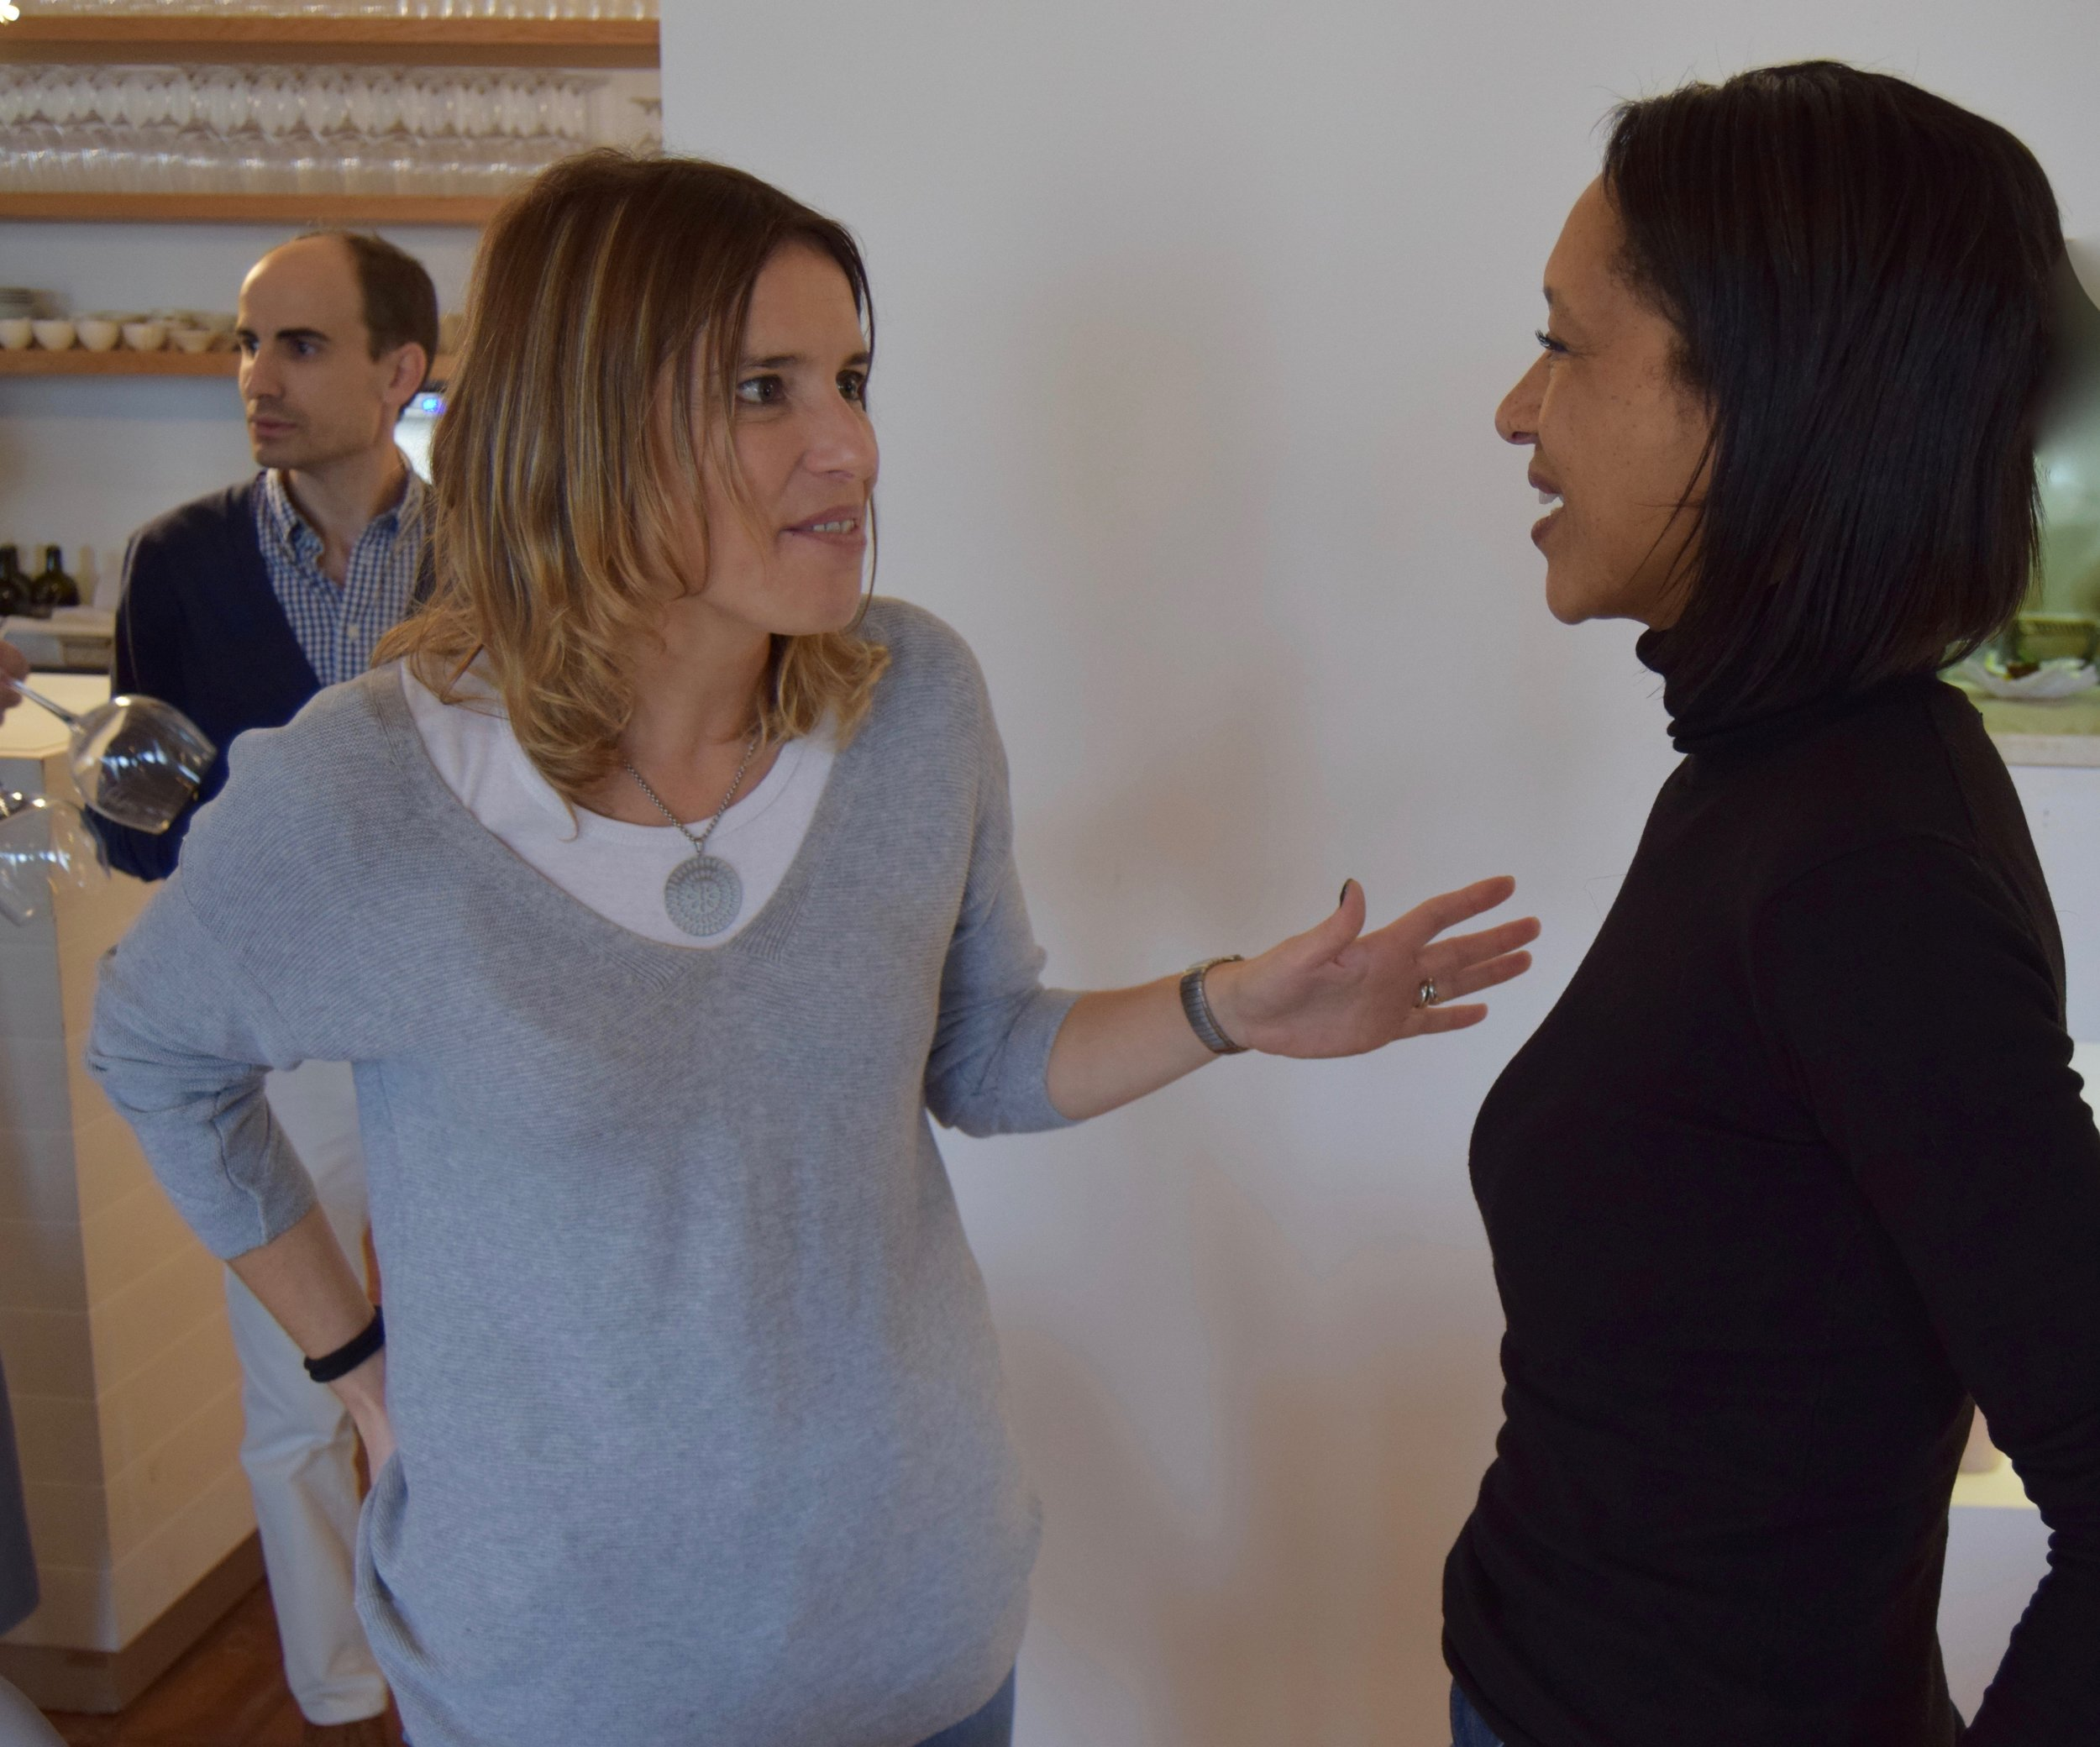 Maria joåo de almeida, famous portuguese journalist & wine critic